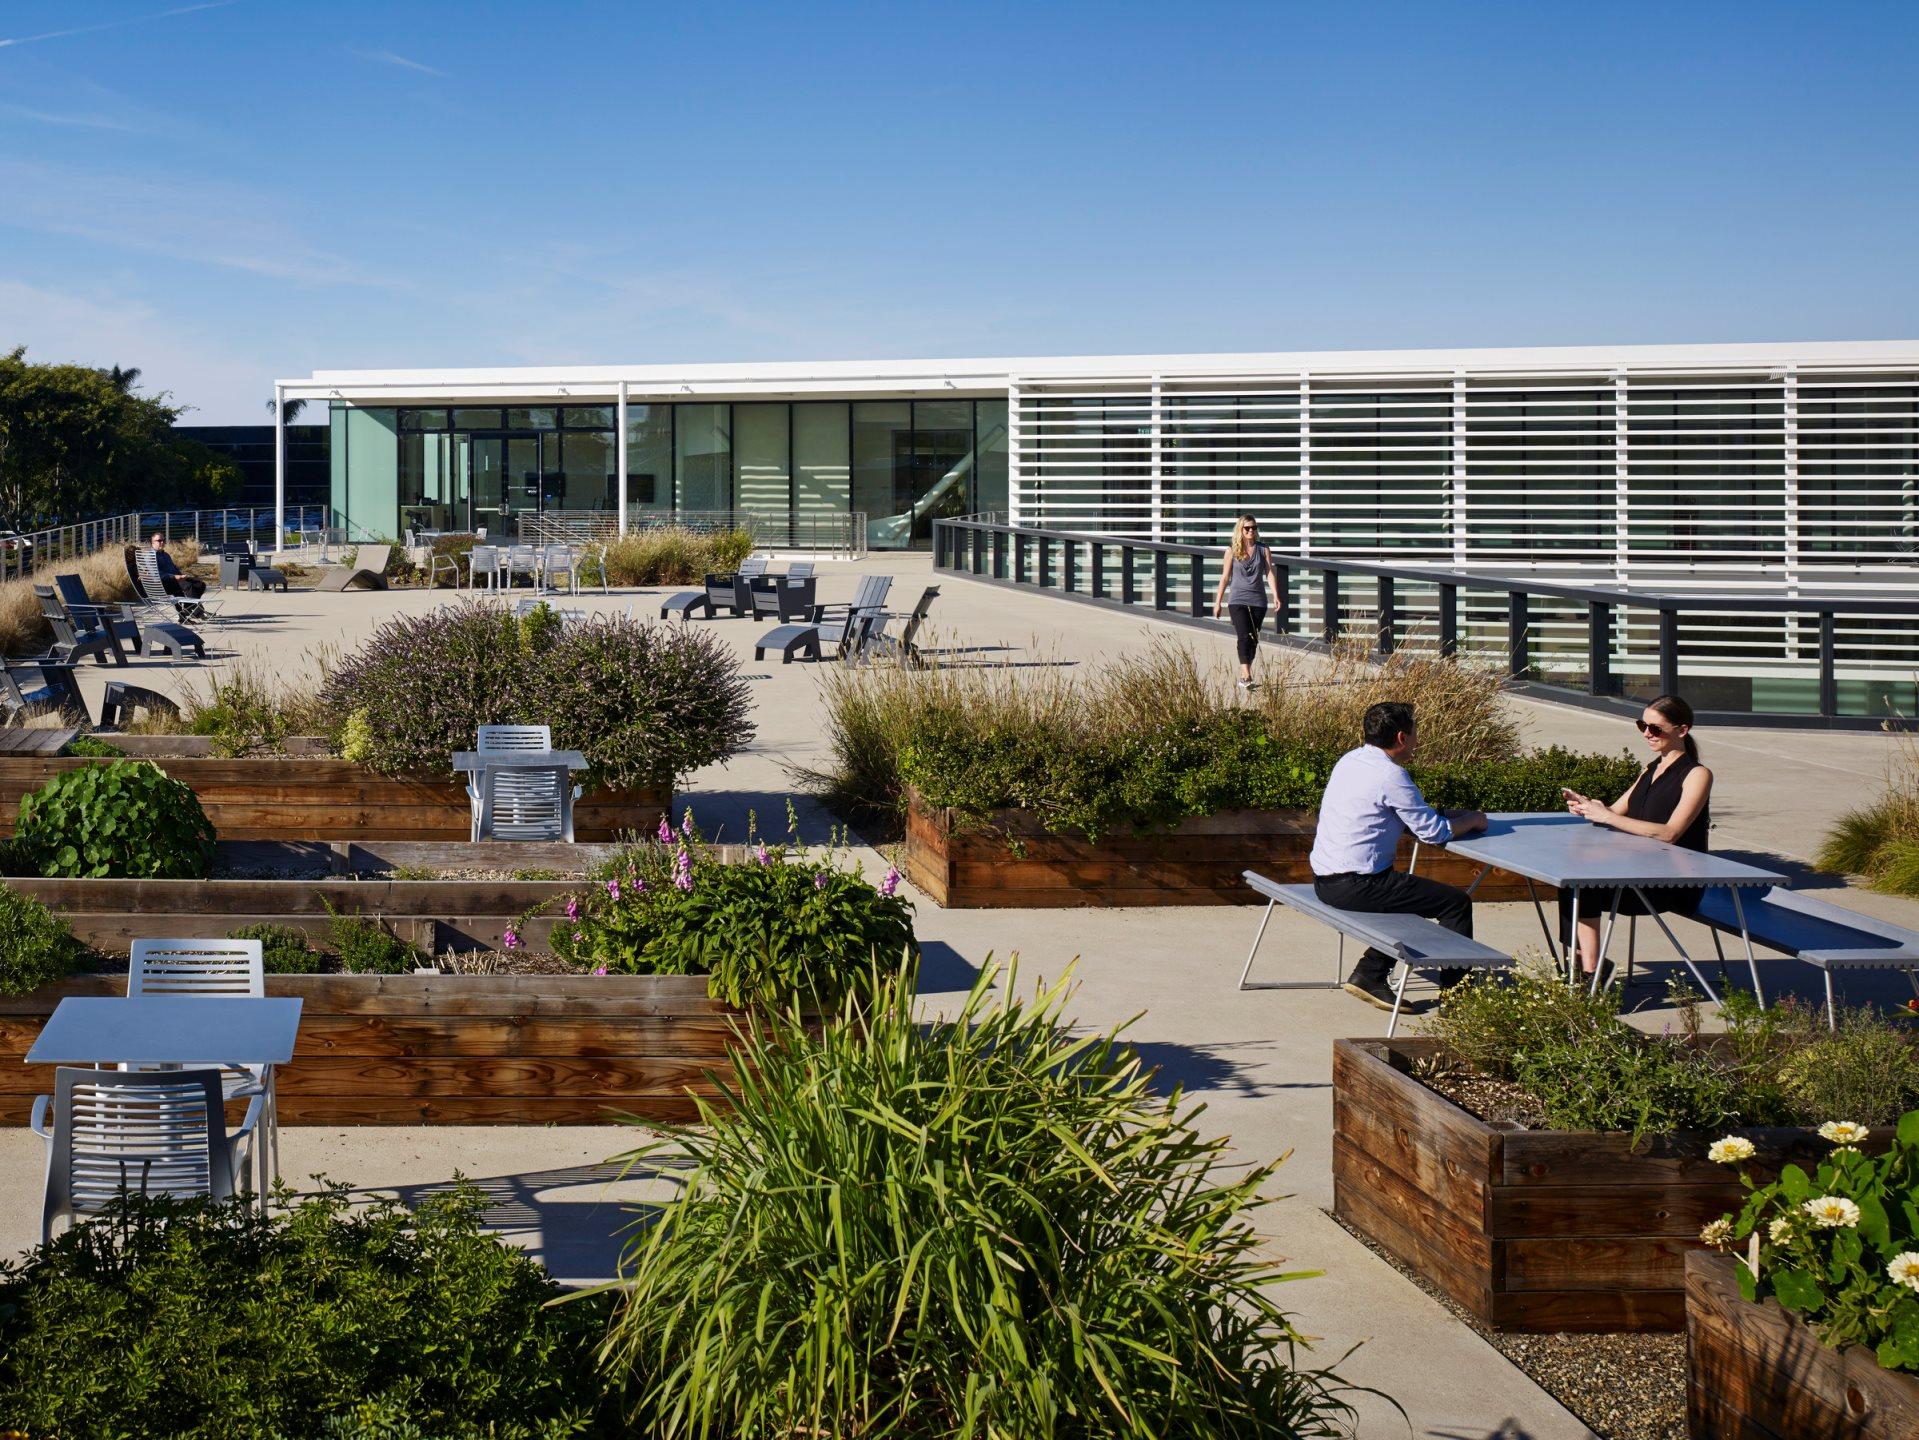 Pacific Center Campus Development Amenities Building